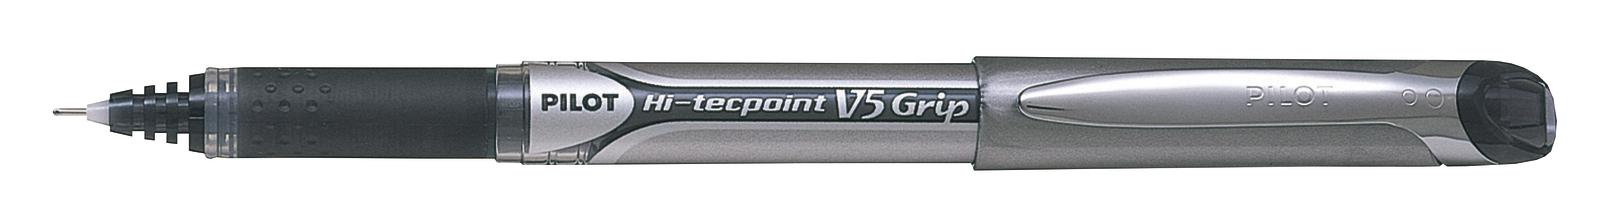 Pilot Hi-Tec V5 Grip Extra Fine Tip Rollerball Pen - Black image